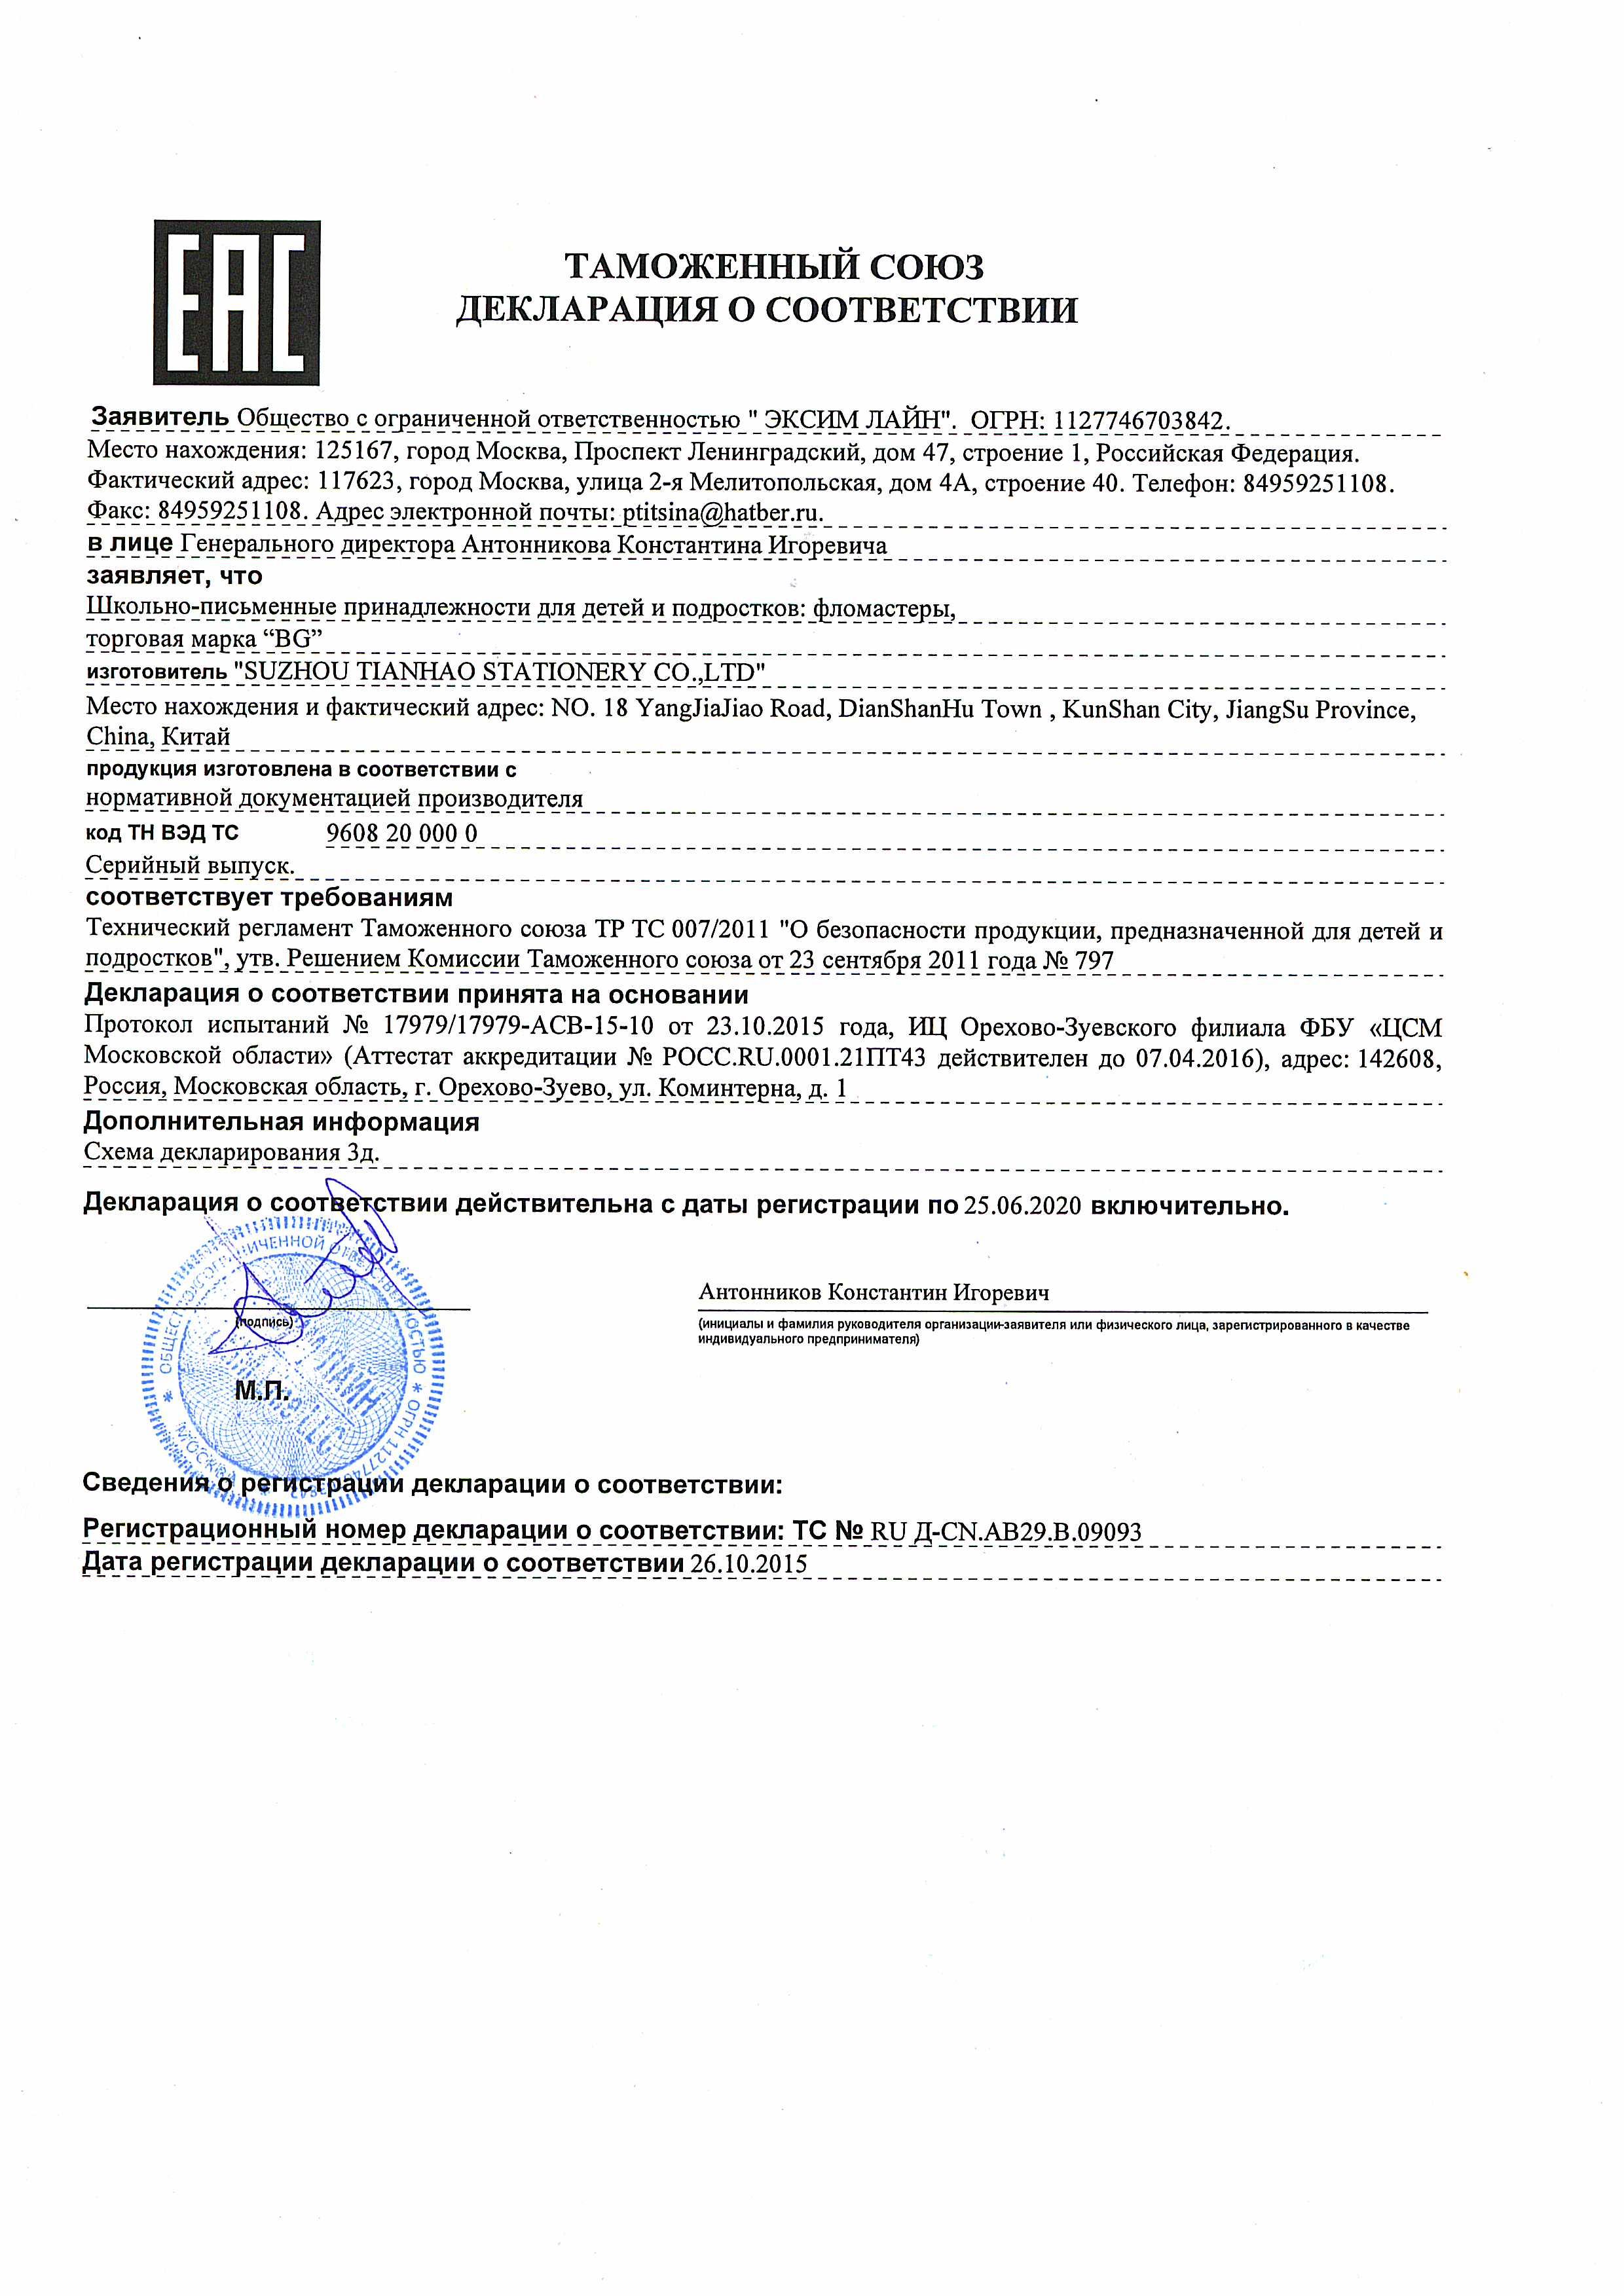 BG Фломастеры 2 до 25.06.2020